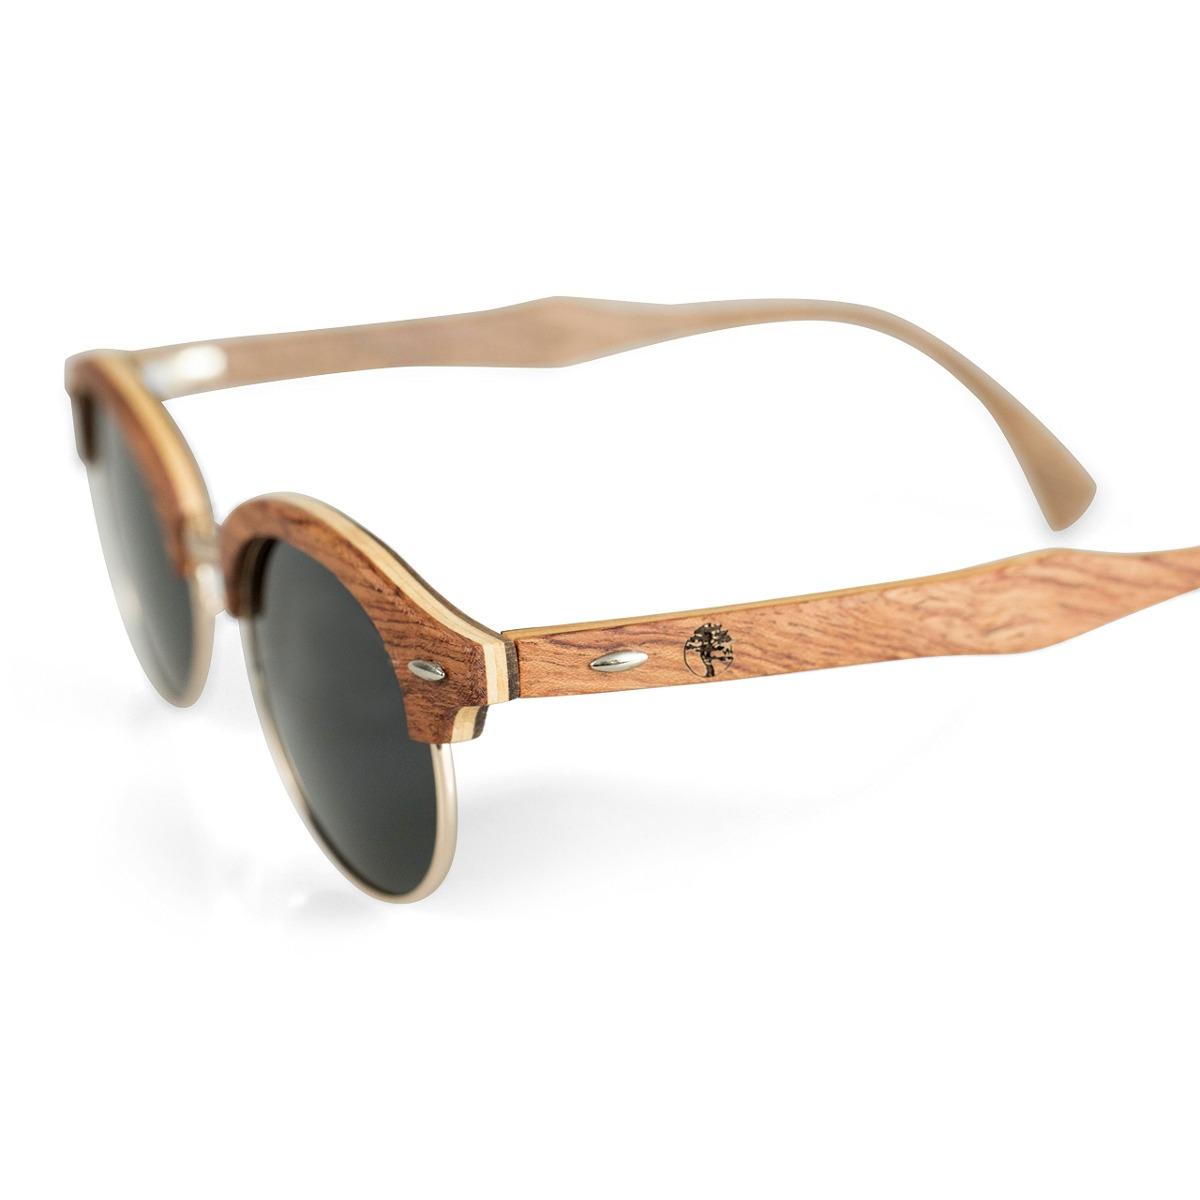 f930d038b3 Gafas De Sol De Madera Viable Harvest Para Mujer, Marcos. - U$S 70 ...